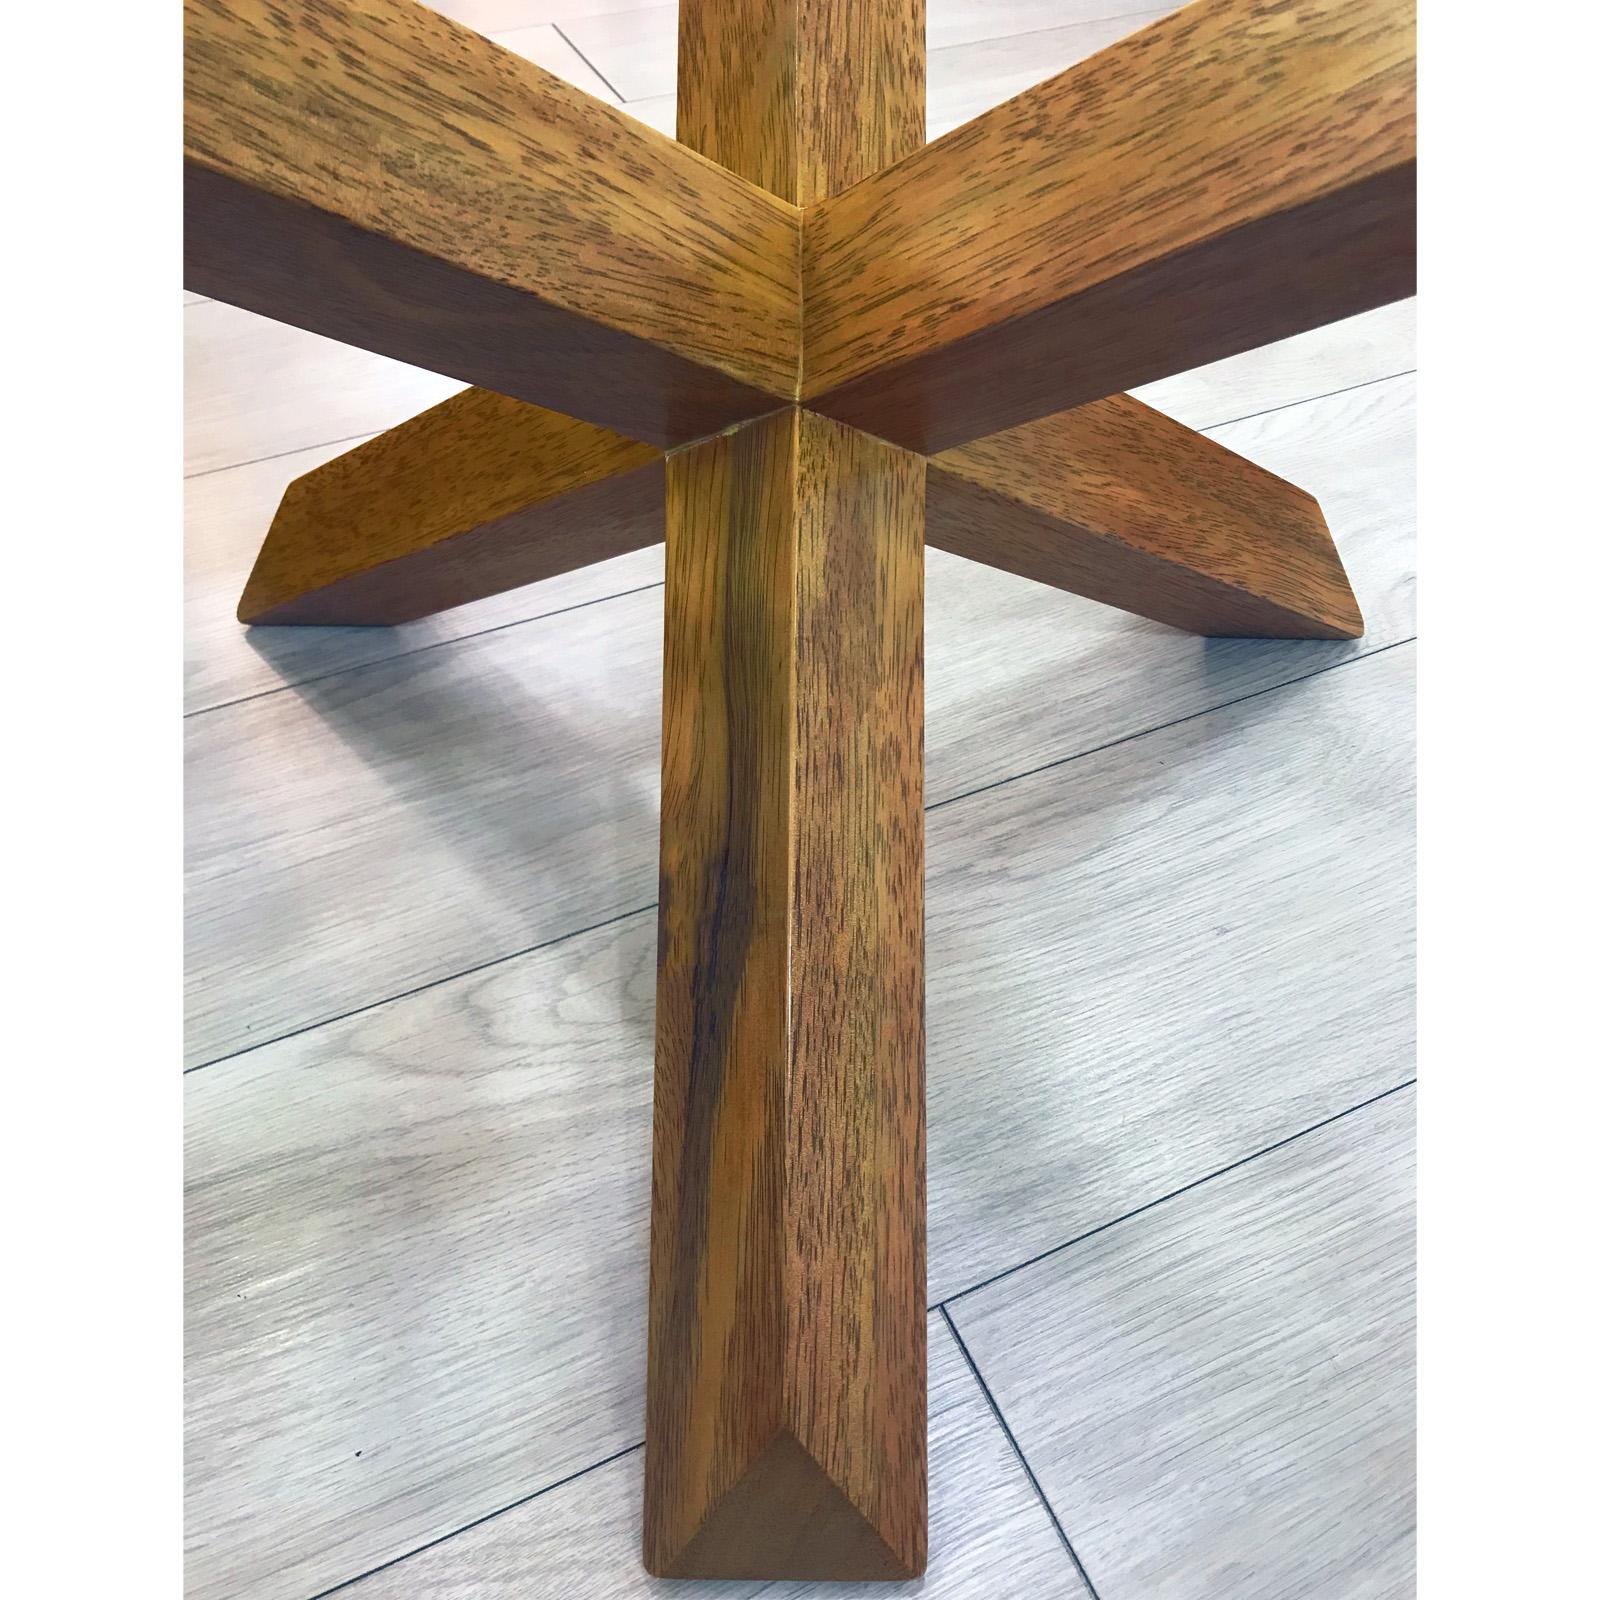 Mesita de madera zeike - Detalle diseño patas